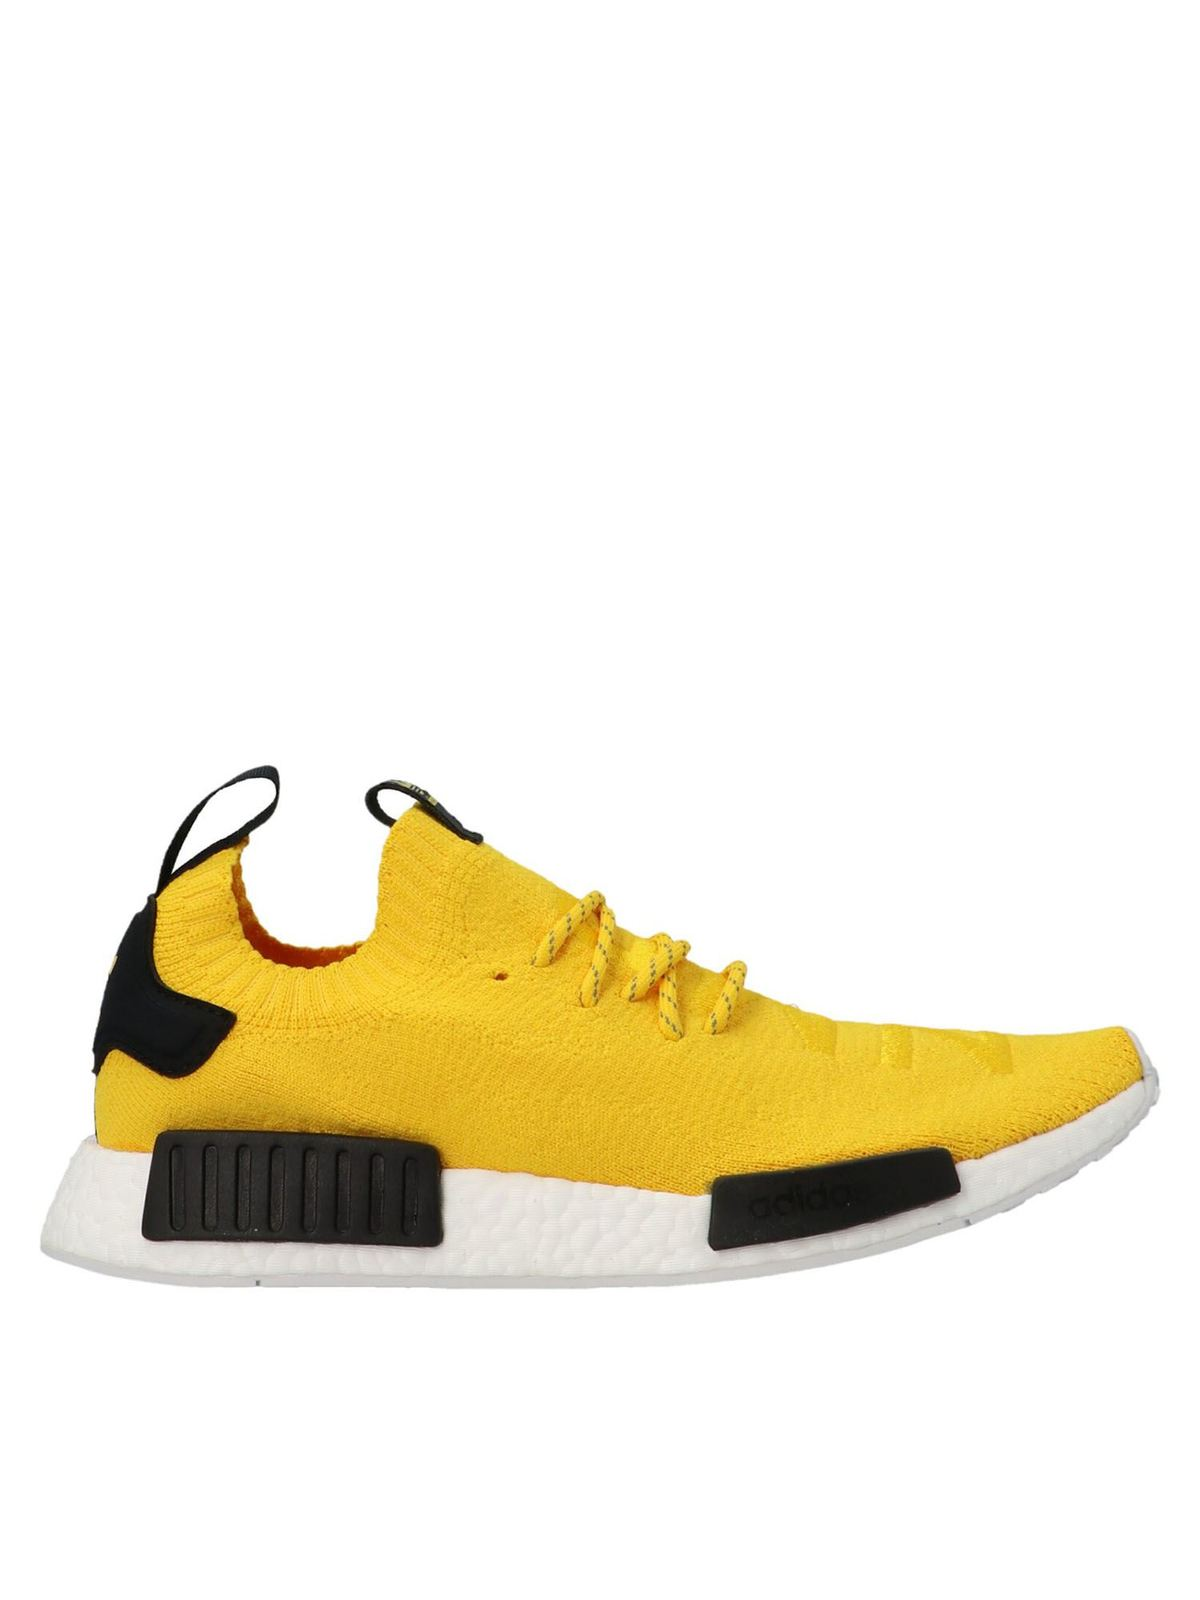 Adidas Originals NMDR1 PRIMEKNIT SNEAKERS IN YELLOW